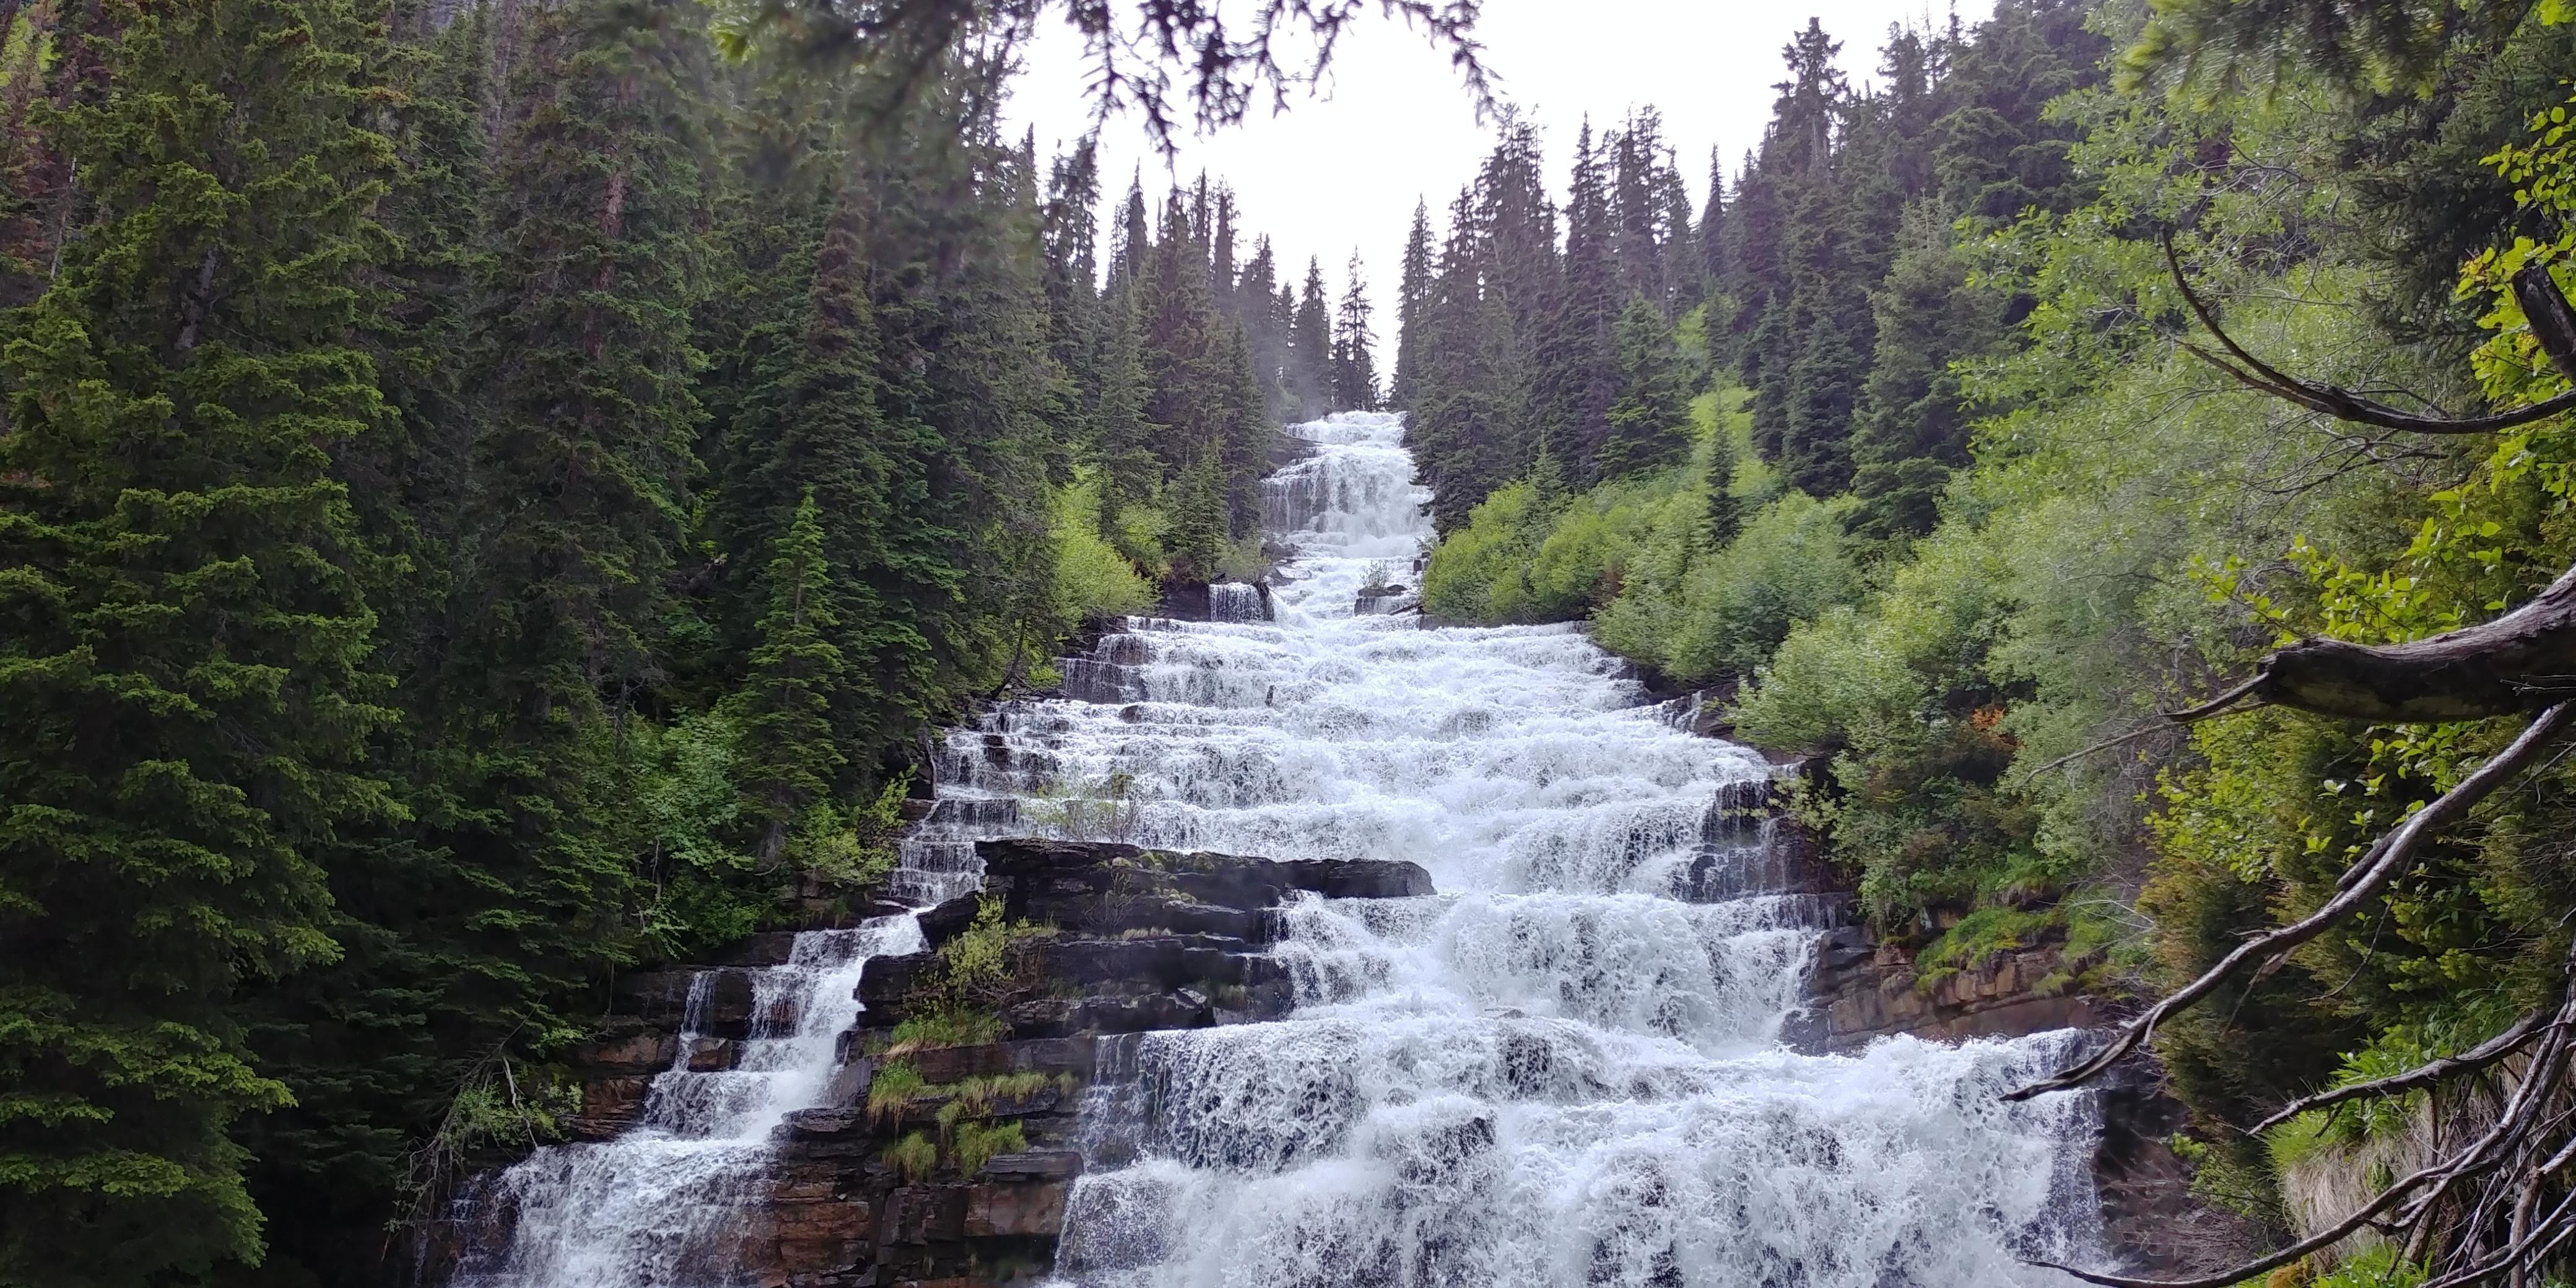 Florence Falls in Glacier National Park [OC] [4160x2080